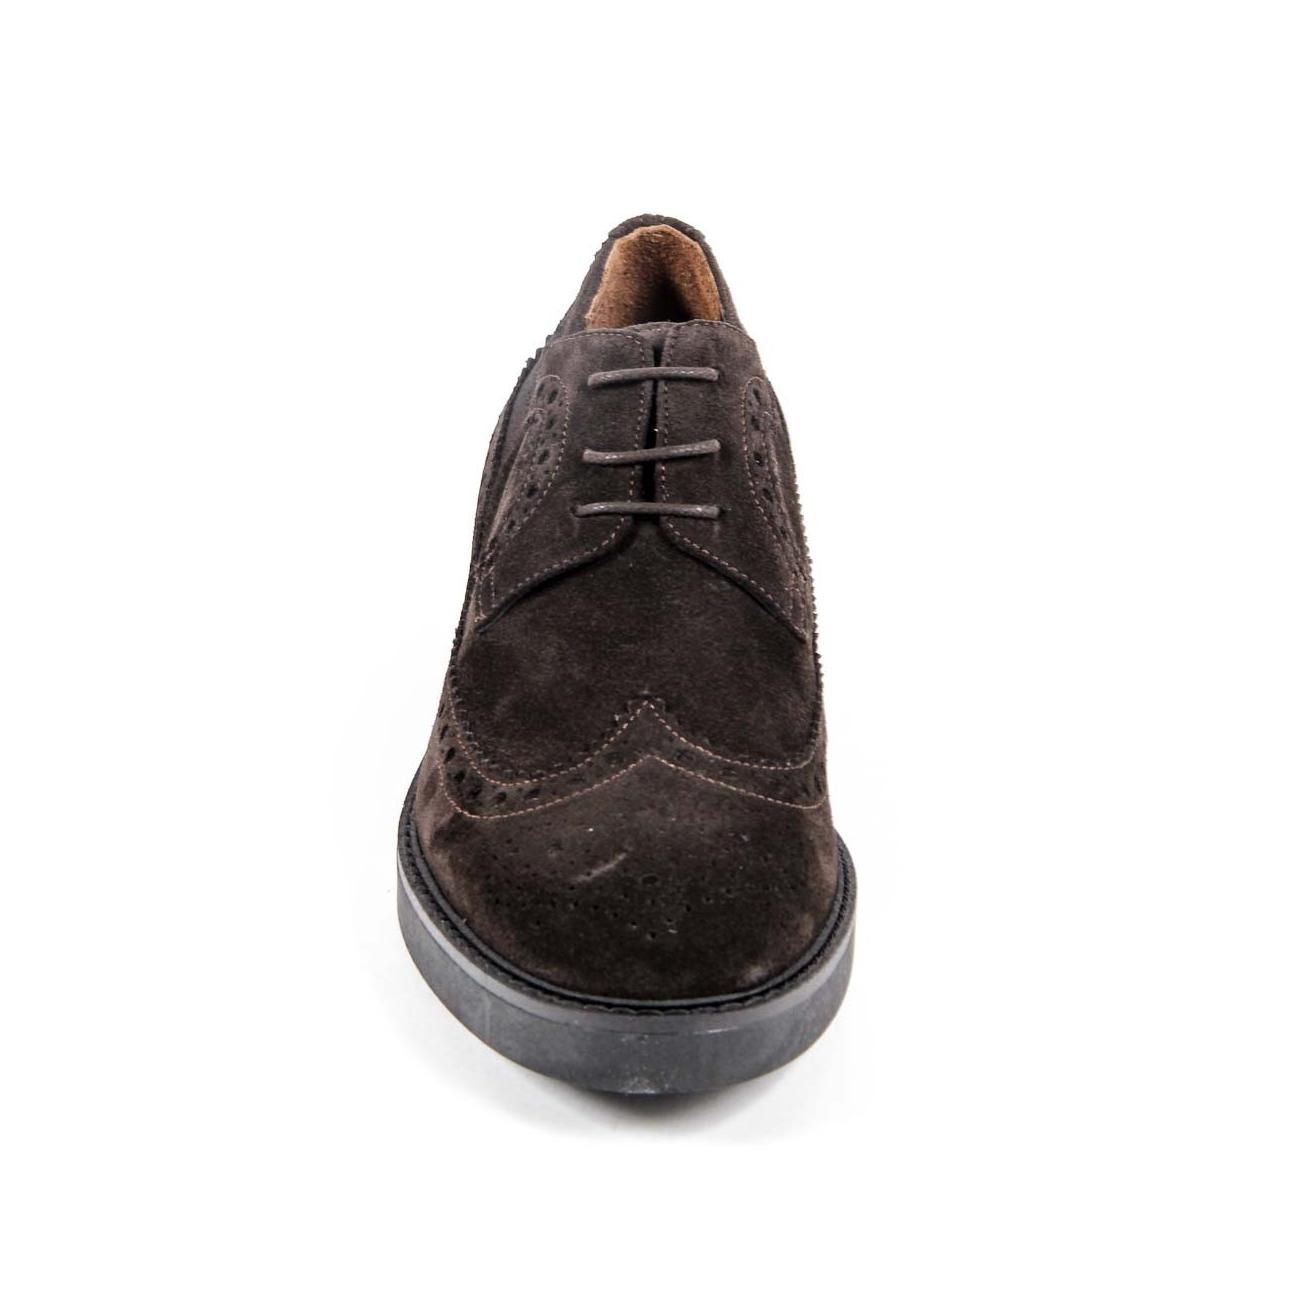 V 1969 Italia Women's Brogue Shoe B1670 VELOUR T. MORO